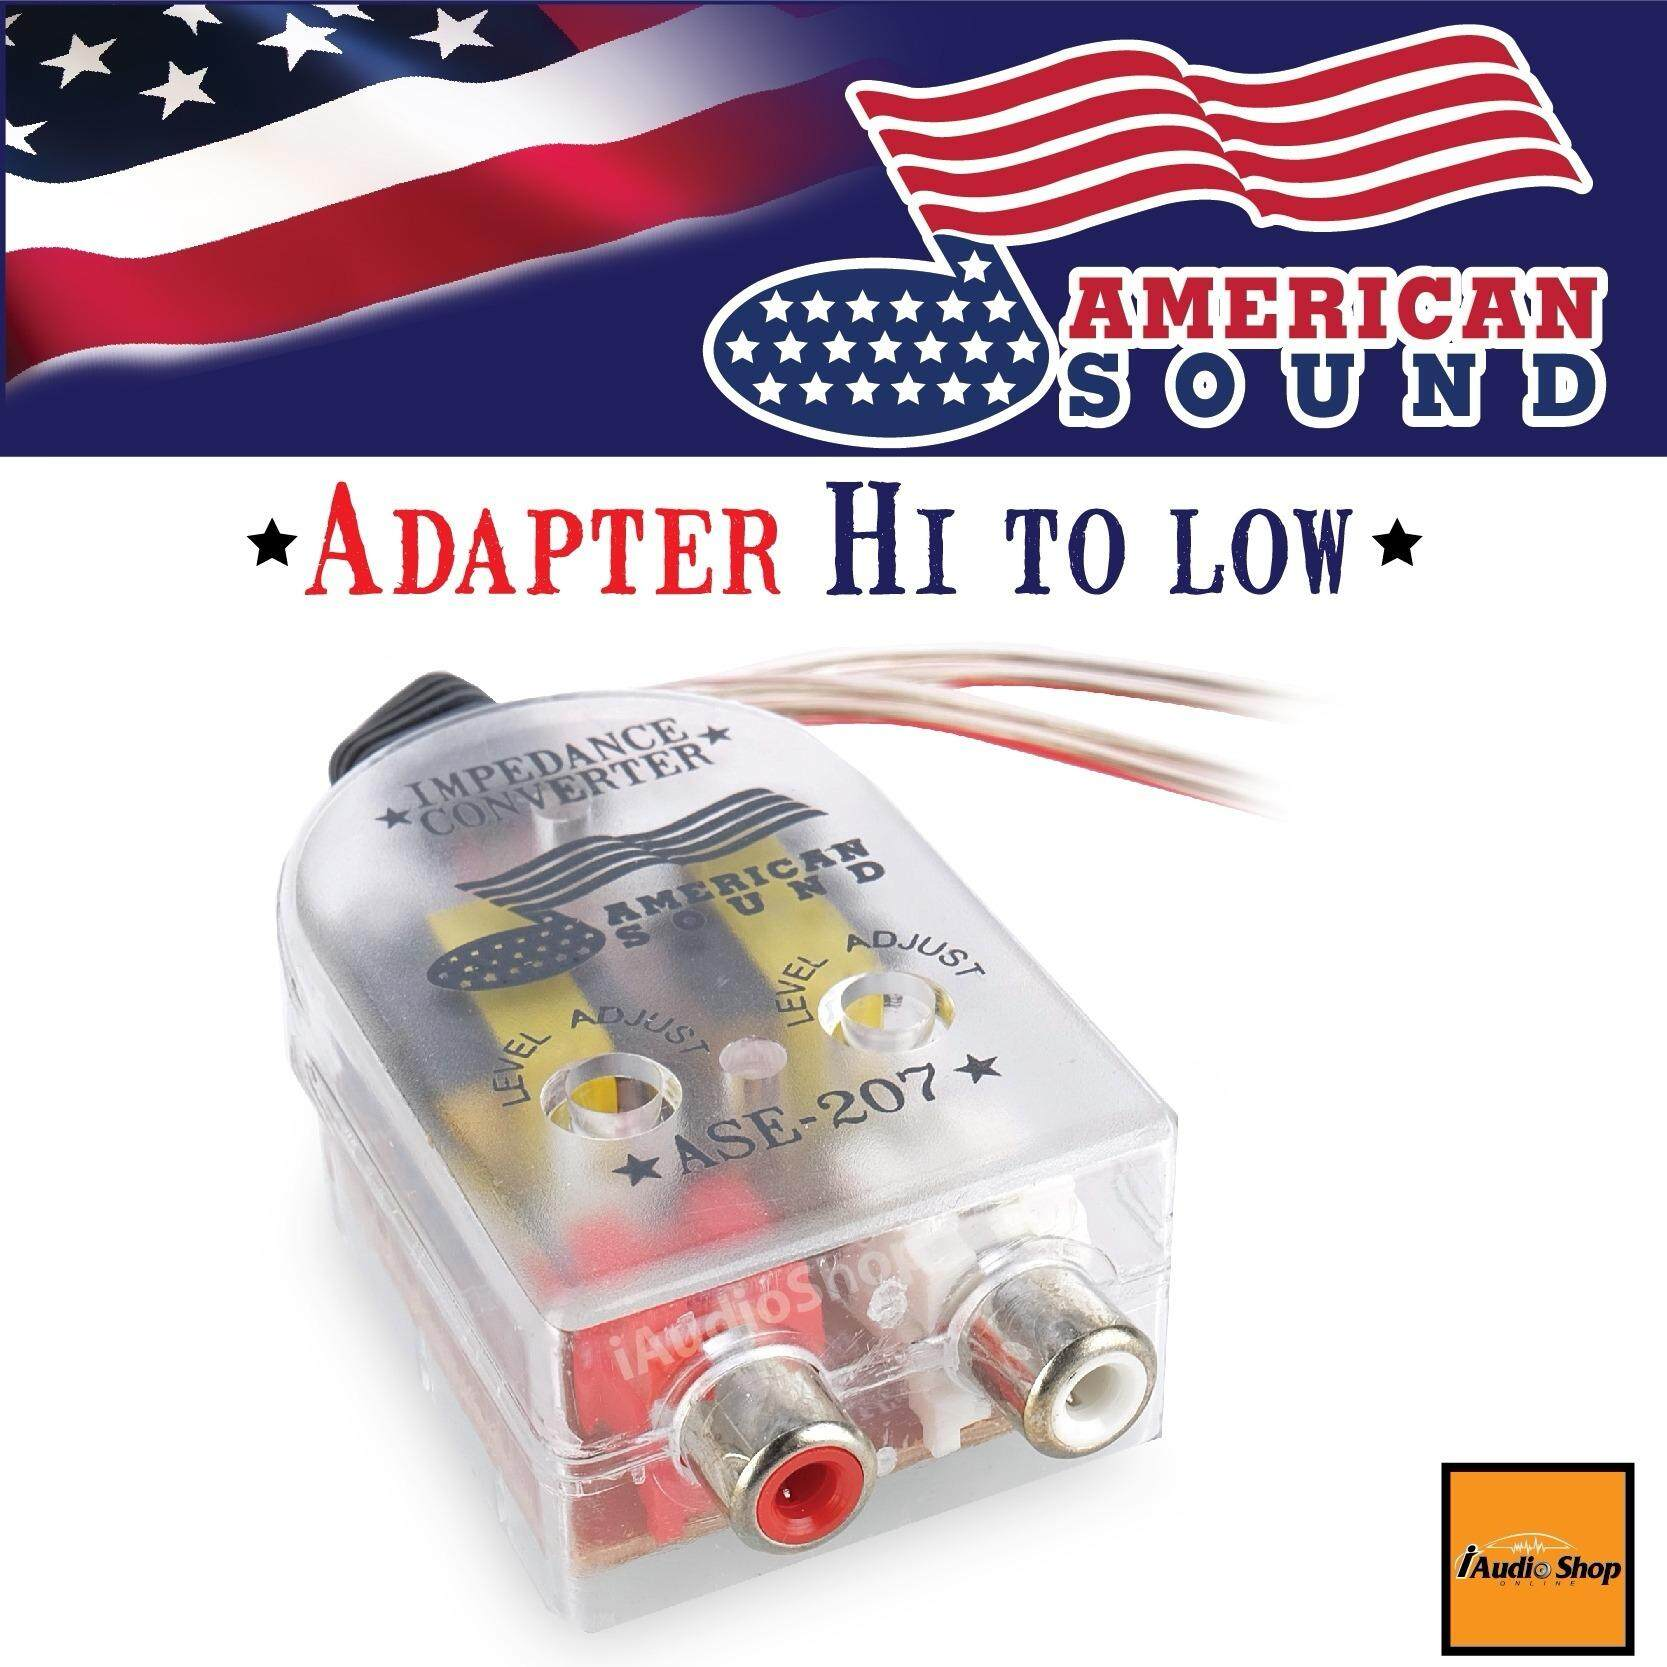 American Sound ตัวแปลงสัญญาณ, อแดปเตอร์, ไฮทูโลว์, Hi To Low Ase-207.